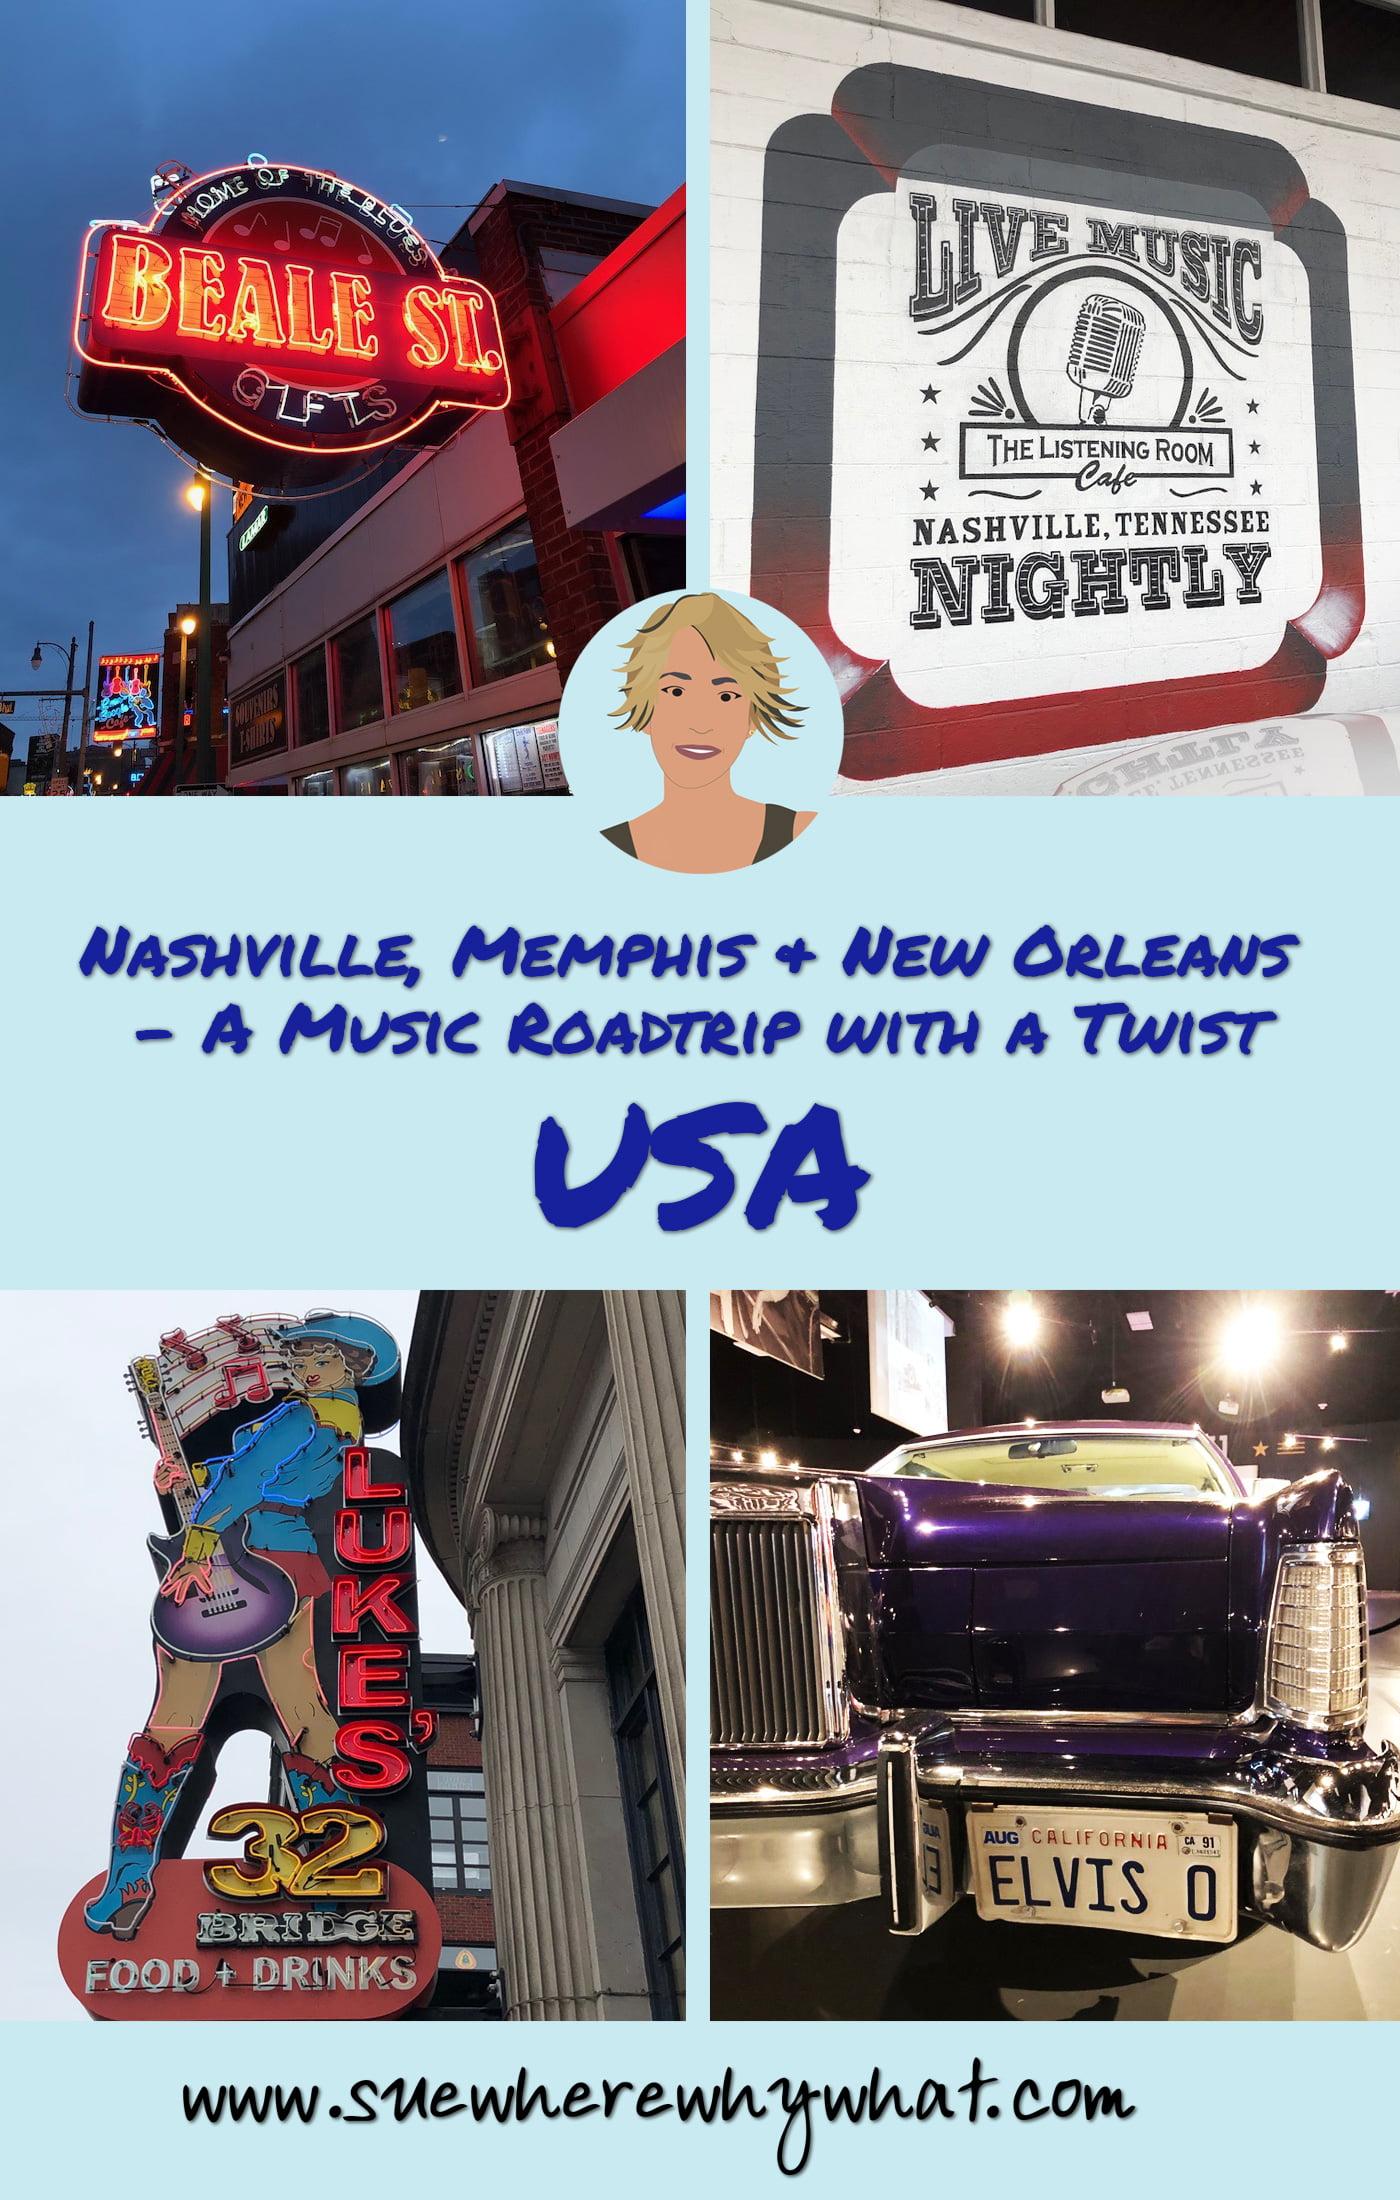 Nashville, Memphis & New Orleans – A Music Roadtrip with a Twist